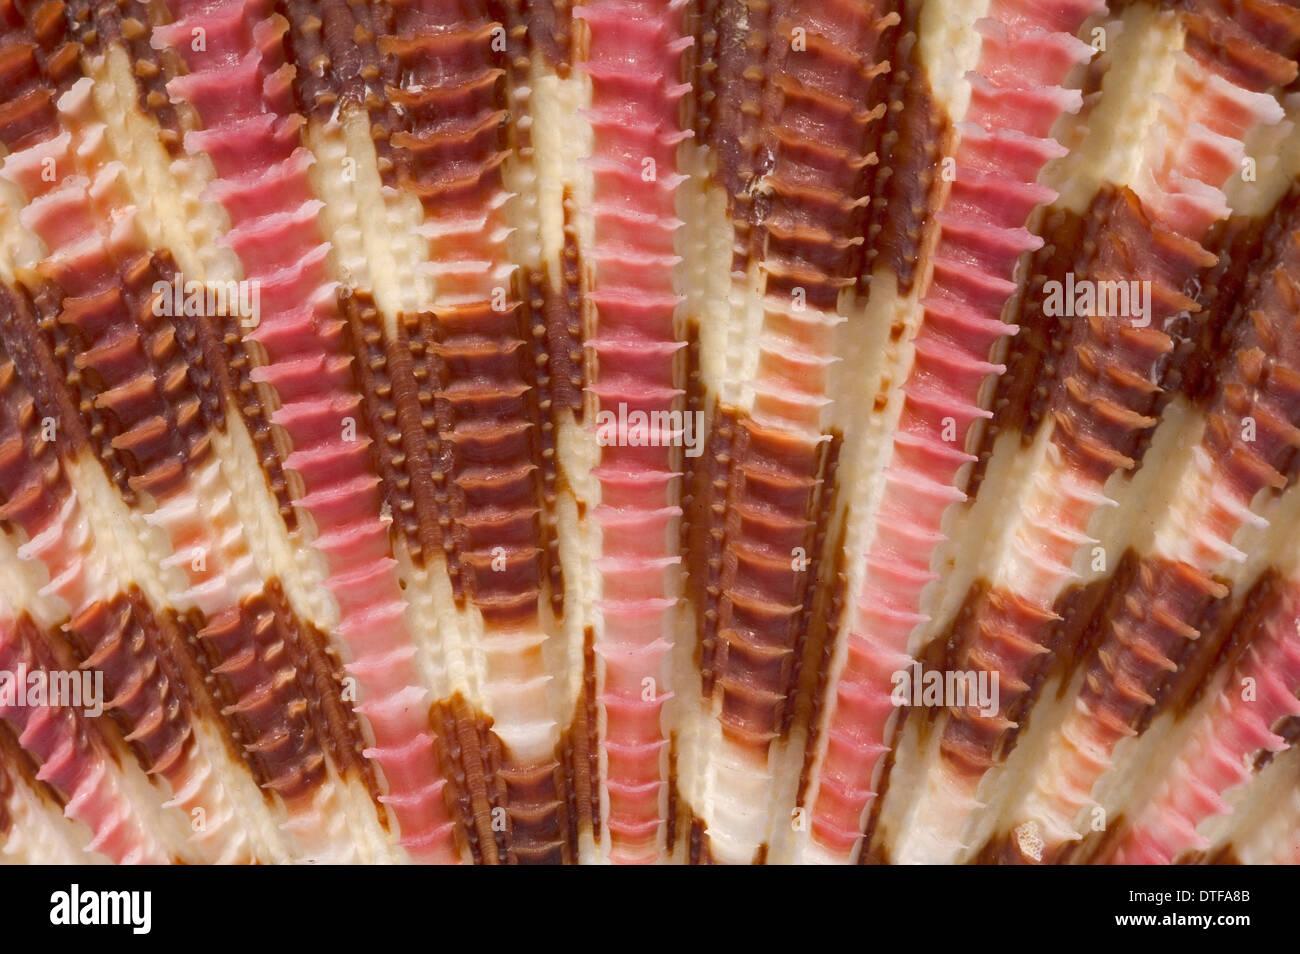 Gloripallium pallium, glory scallop - Stock Image